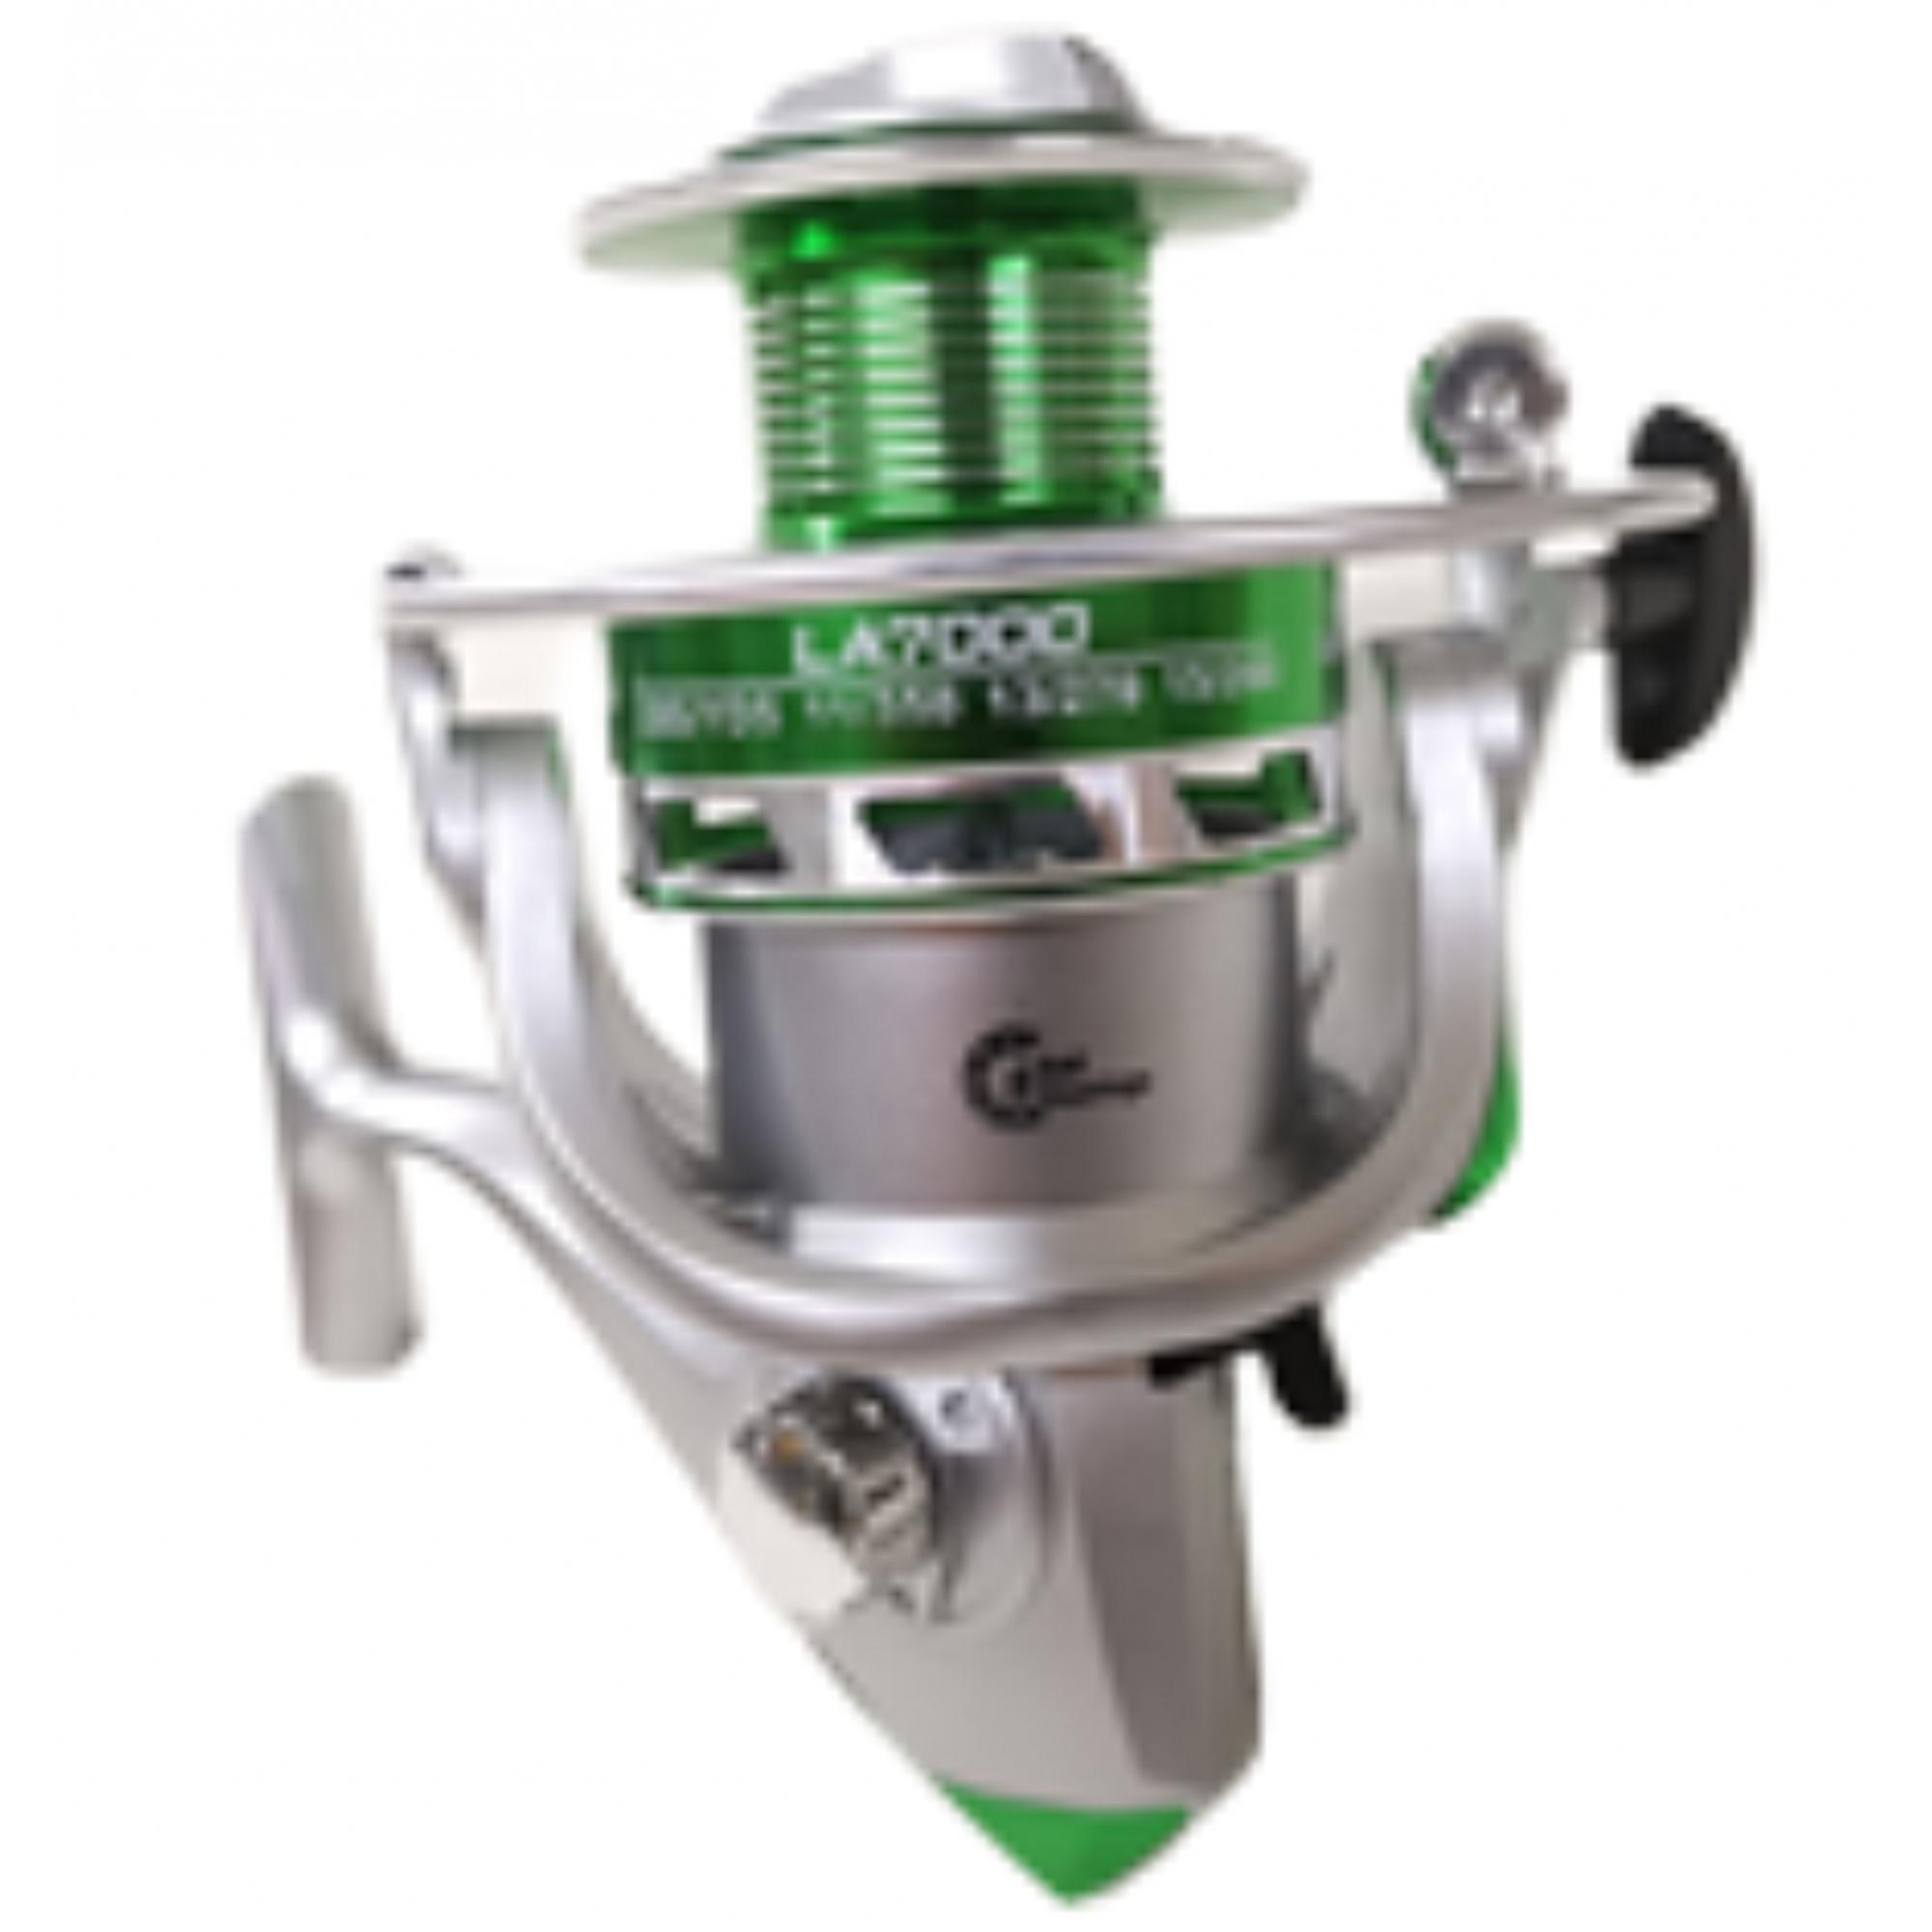 Molinete 3000 LA 6 Rolamento Carretel Alumínio Drag 3,5kg